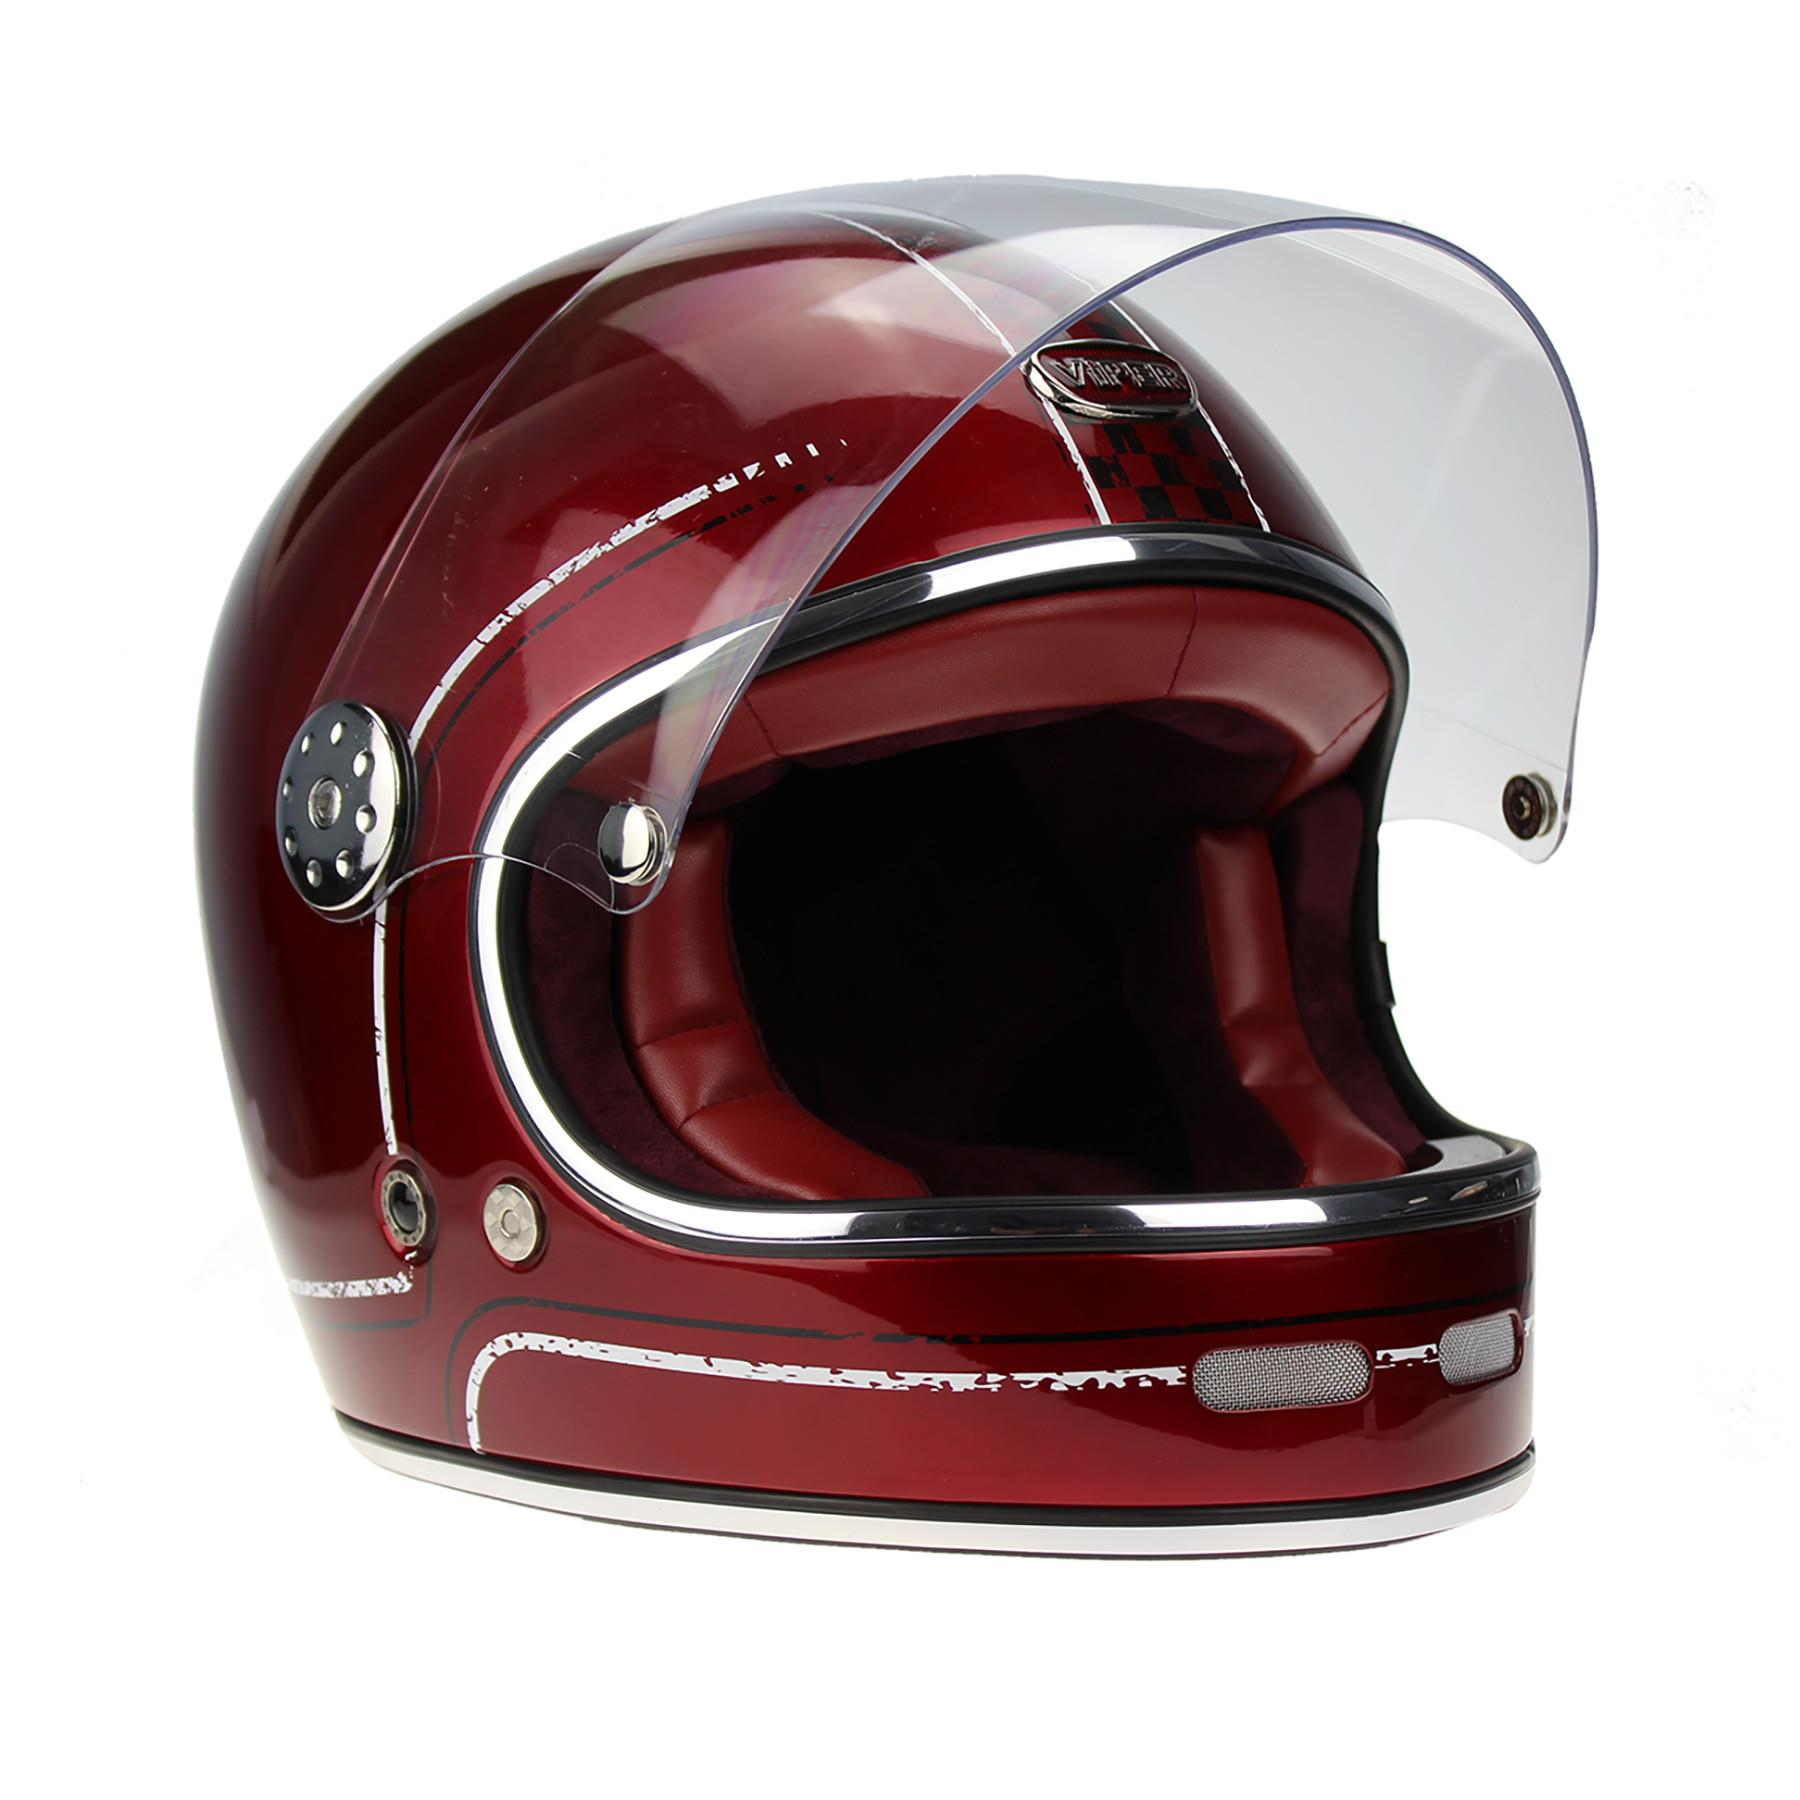 Viper-F656-Retro-Vintage-FibreGlass-Full-Face-Motorcycle-Bike-Road-Crash-Helmet miniature 10